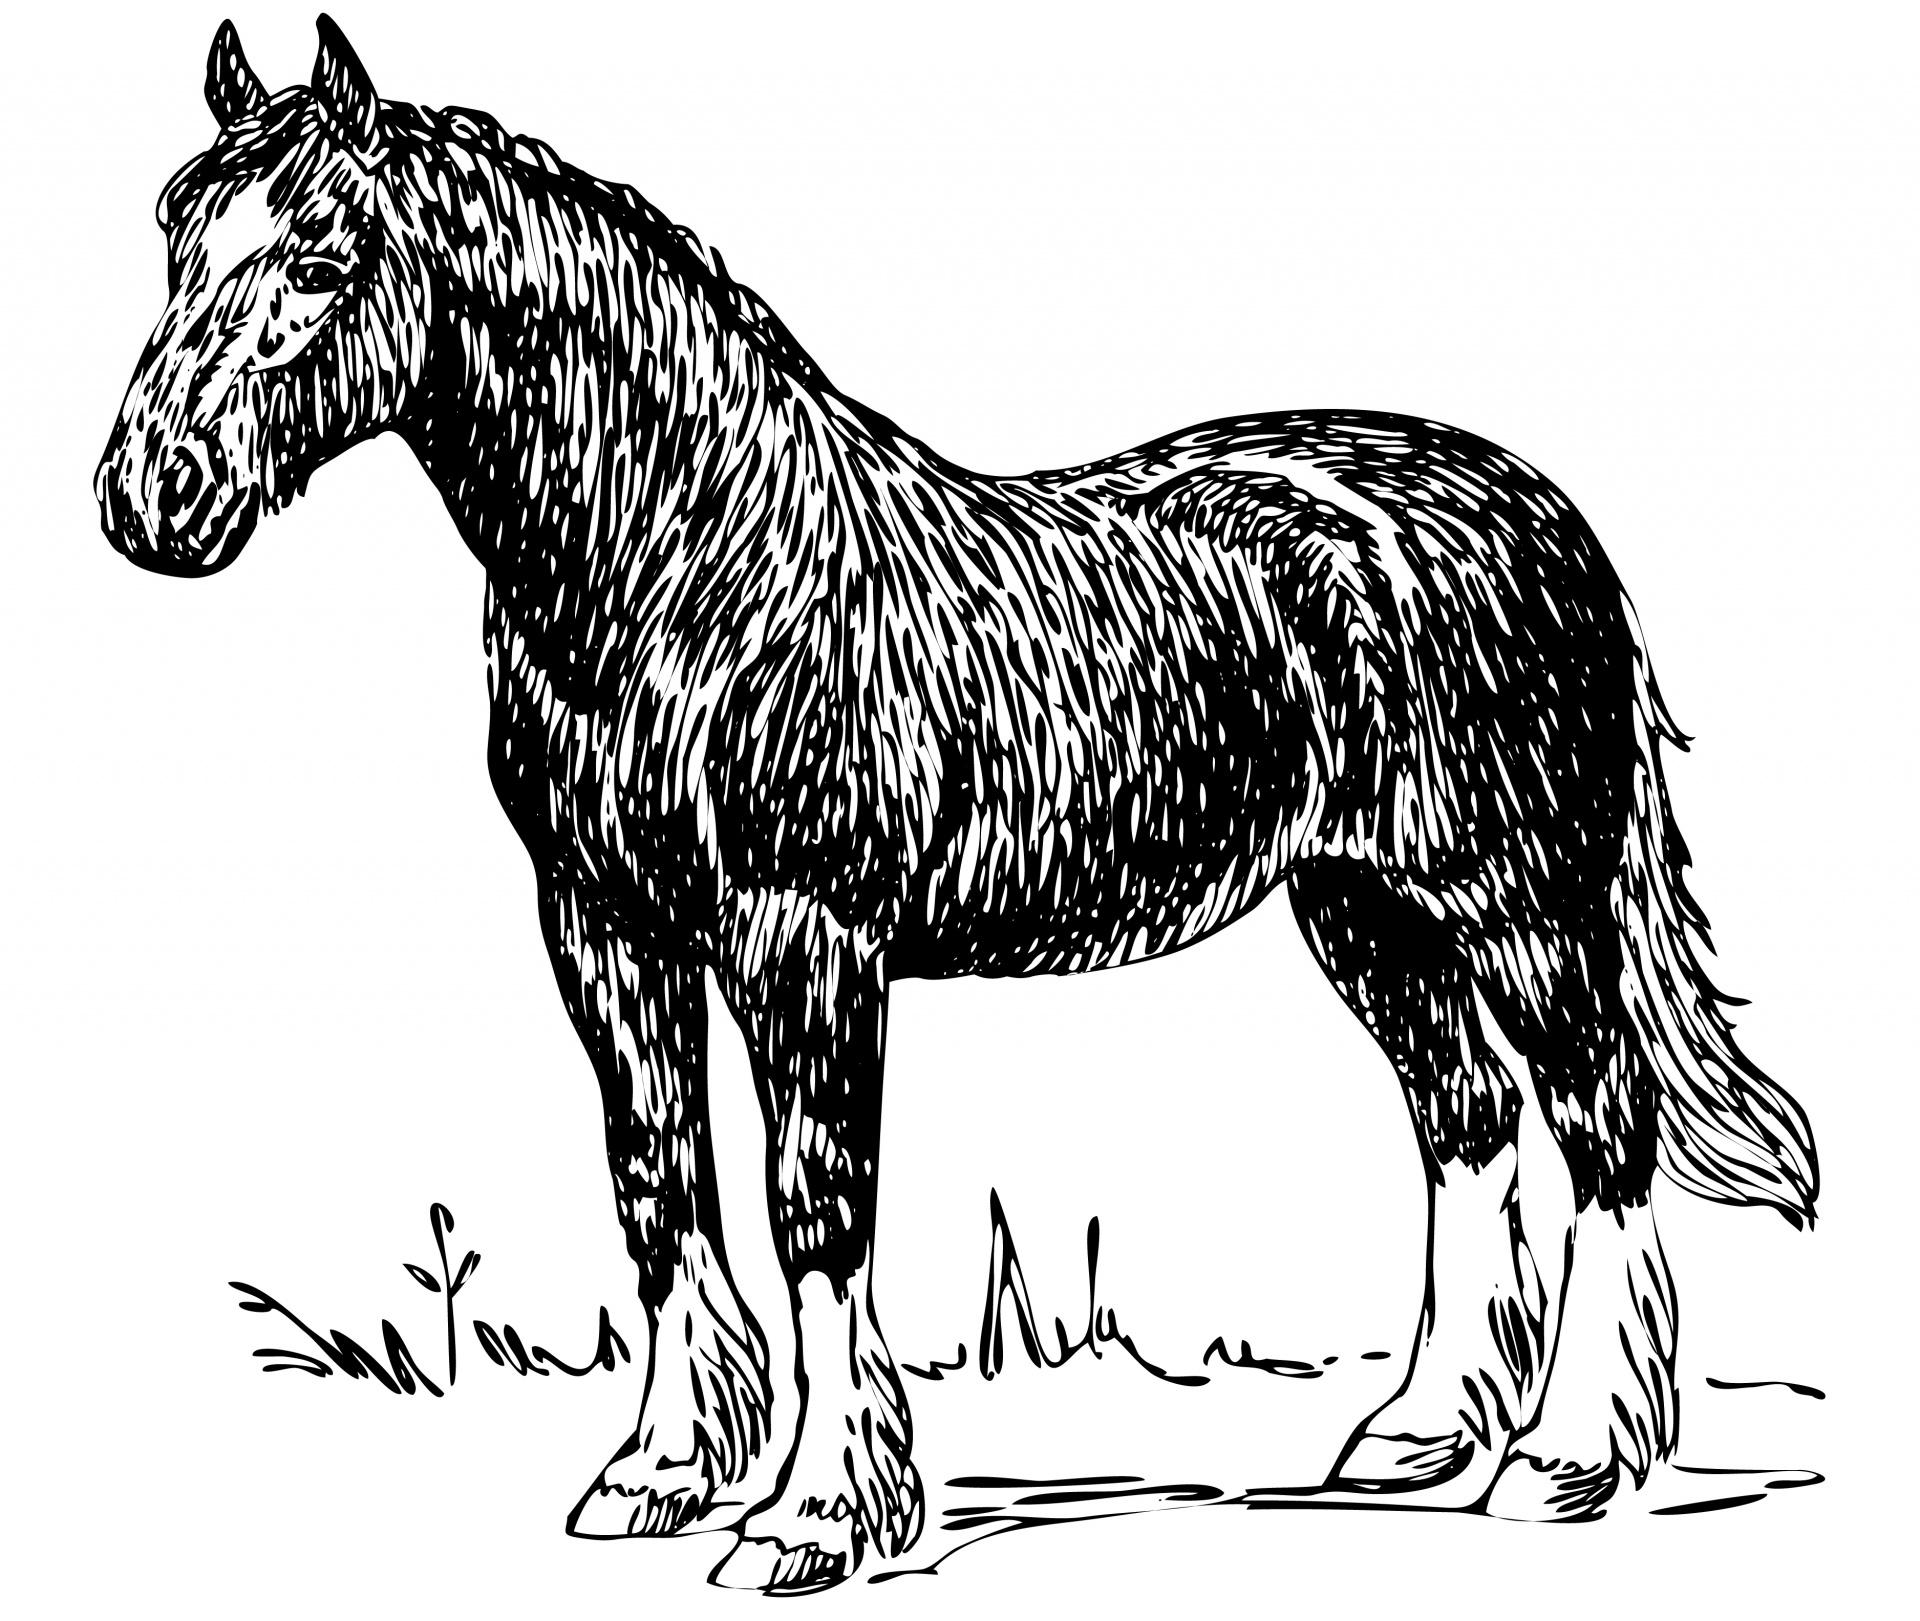 Horse Illustration Clipart Free Stock Photo - Public Domain Pictures